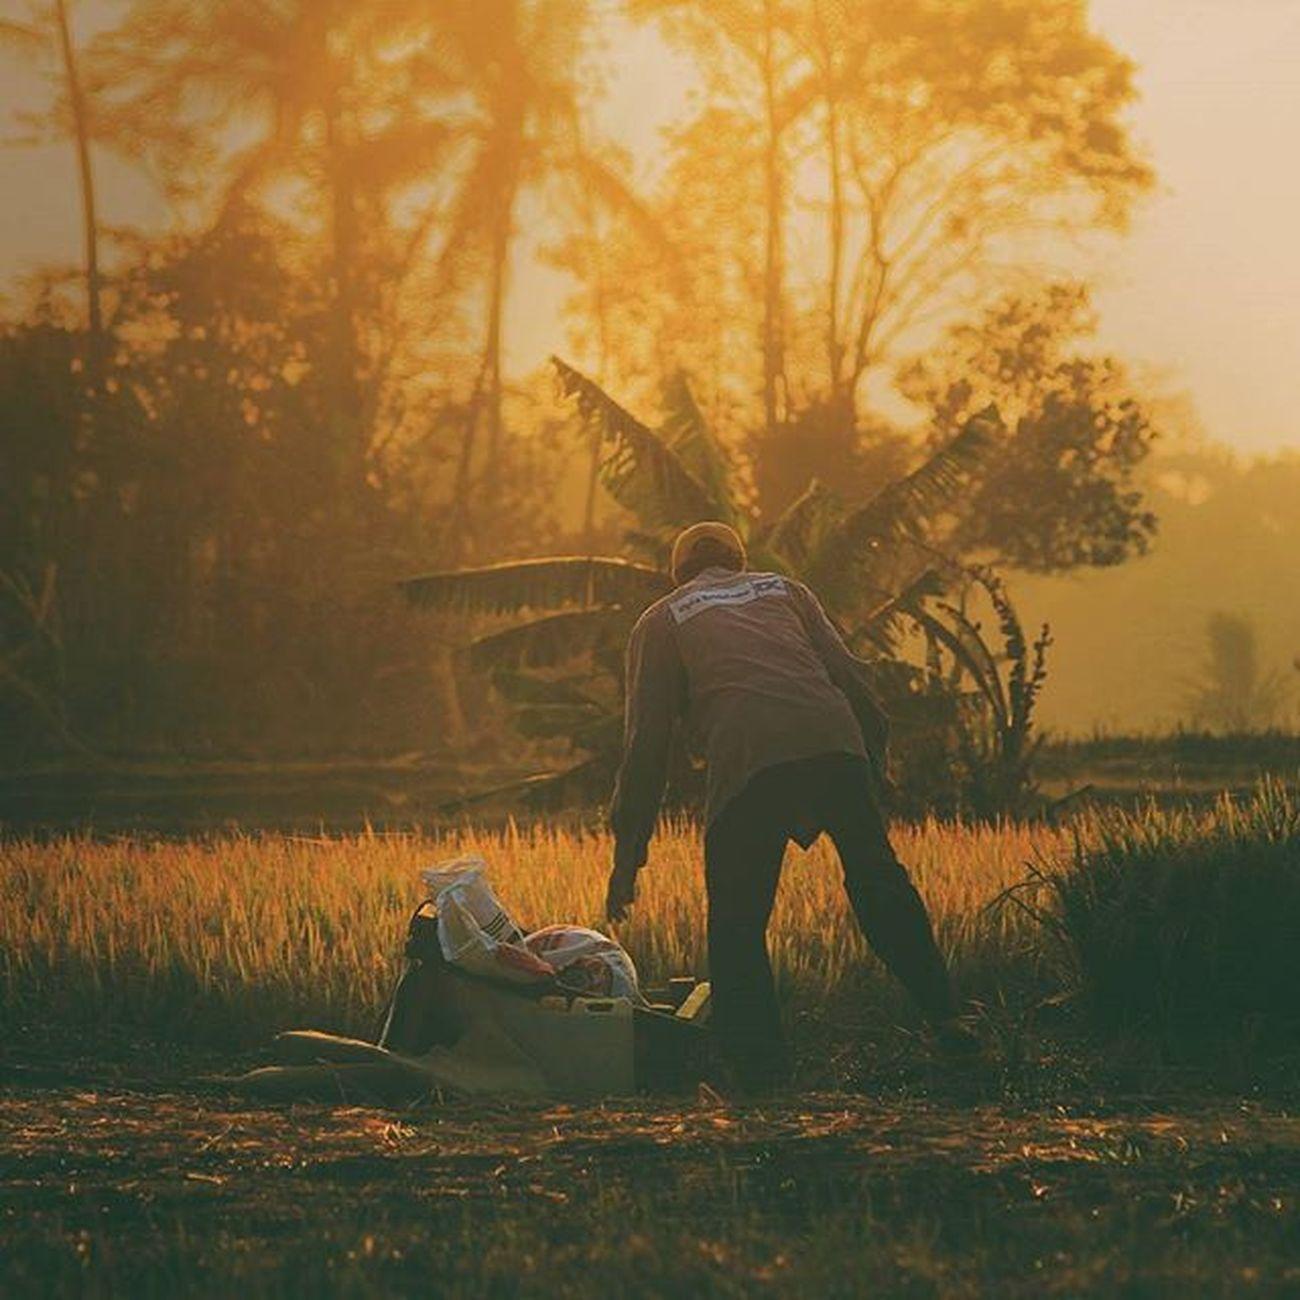 ●●●●● ...Sound of Morning Folk... ________________ Indotravellers Cameraindonesia Canon Berlagakexplore